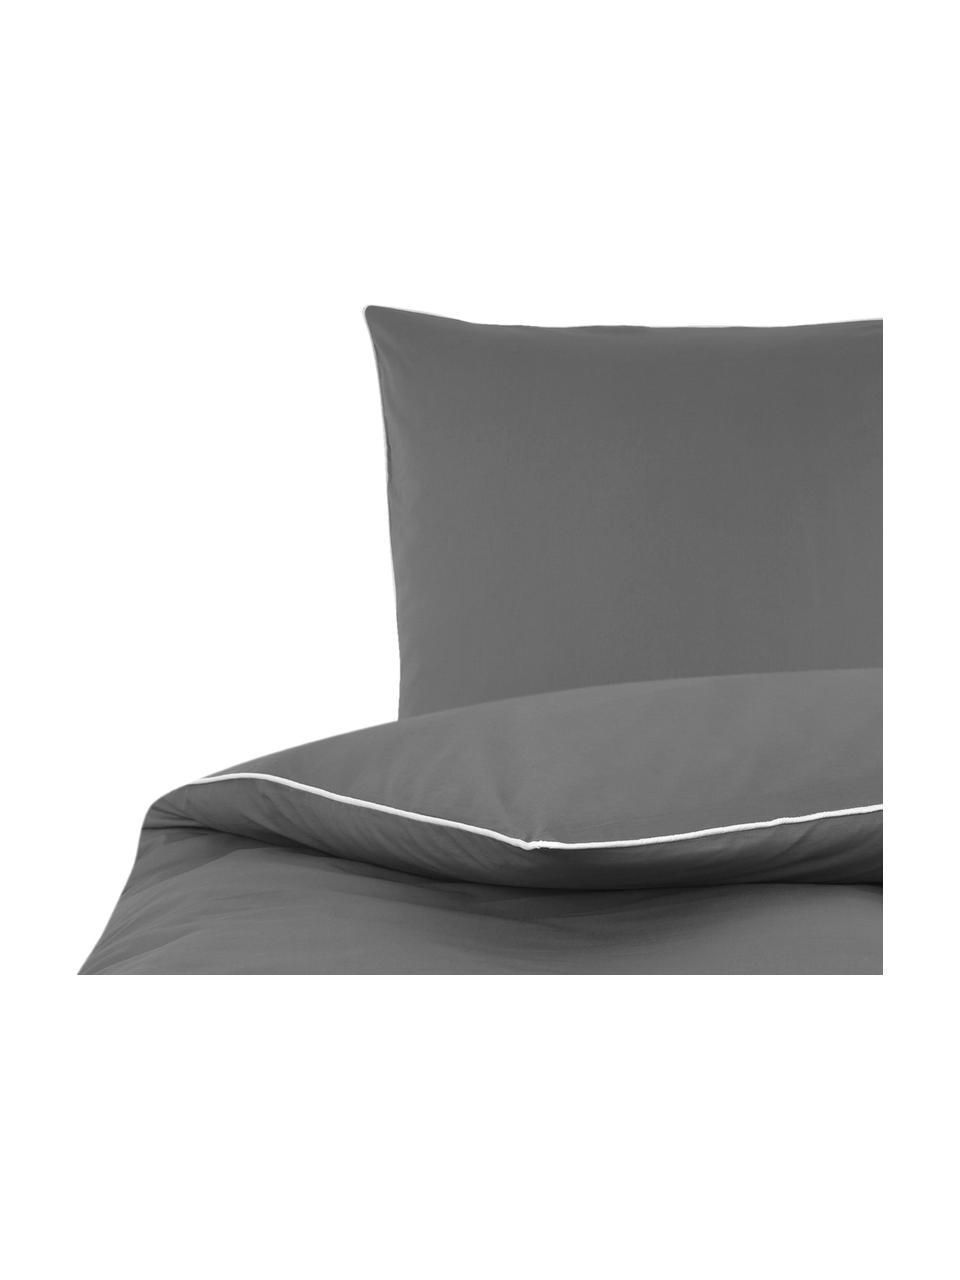 Baumwollperkal-Bettwäsche Daria in Grau mit Keder, Webart: Perkal Fadendichte 200 TC, DunkelgrauKederumrandung: Weiß, 240 x 220 cm + 2 Kissen 80 x 80 cm